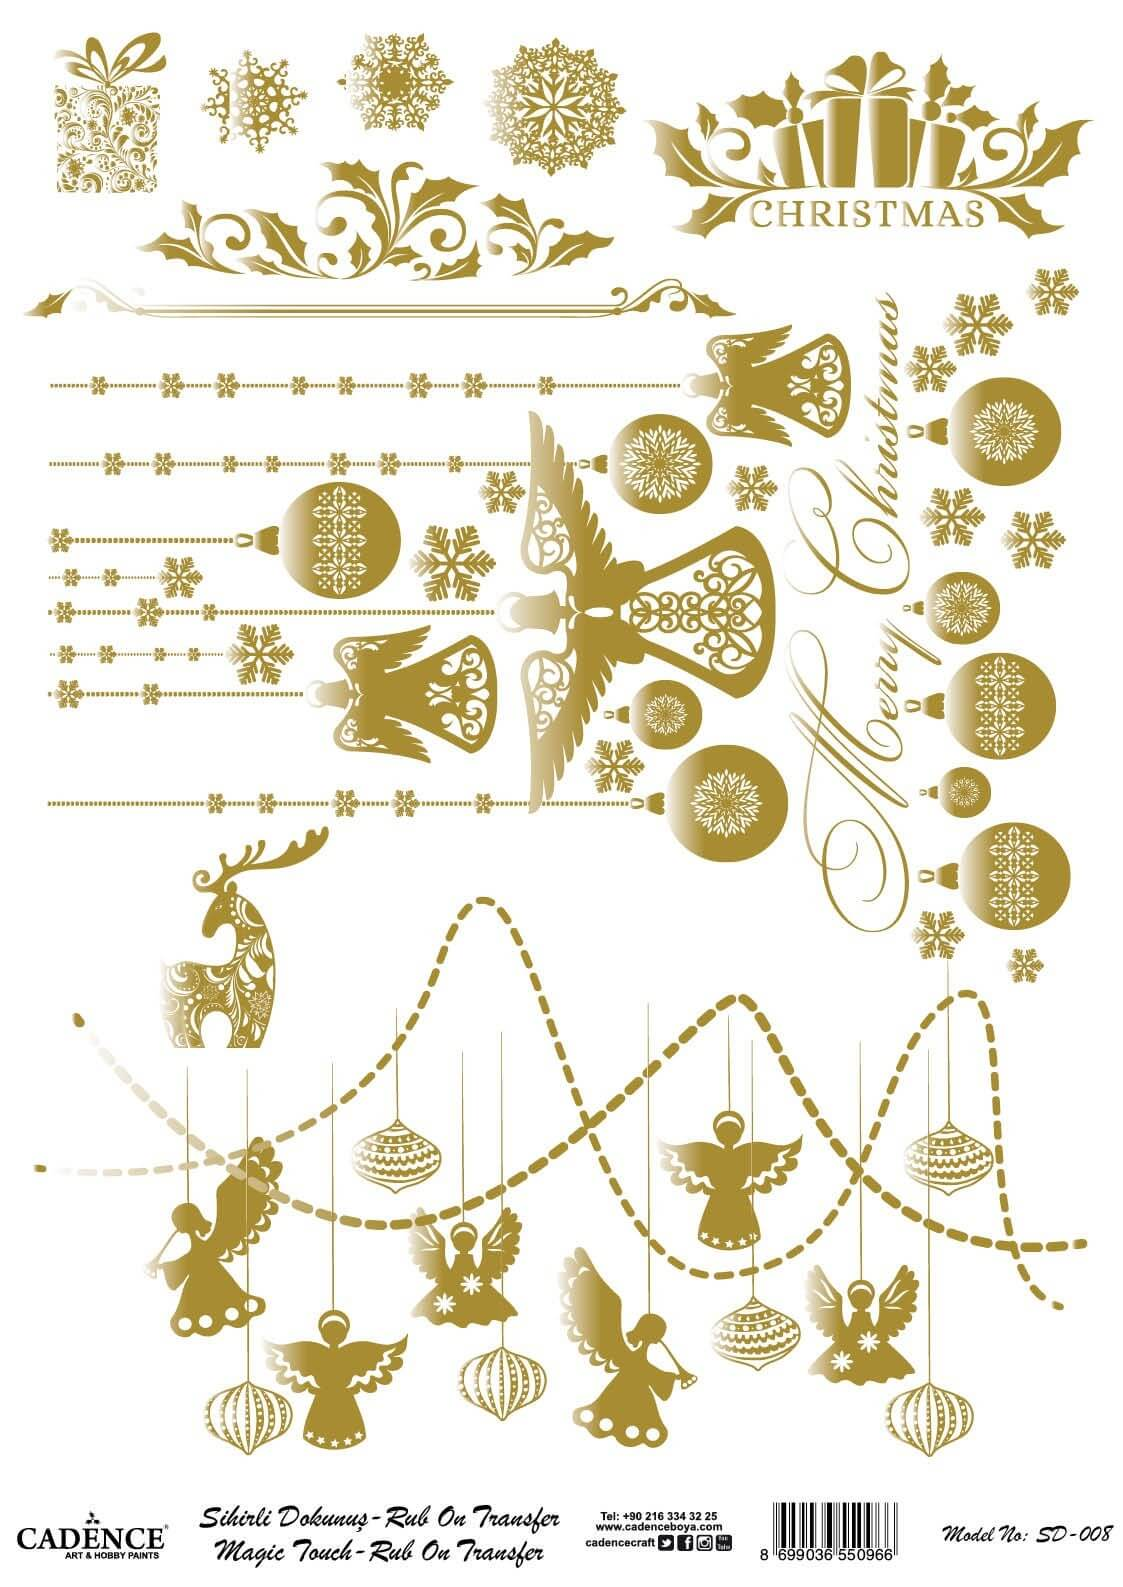 Sihirli Dokunuş Rub-On - Mery Christmas SD008